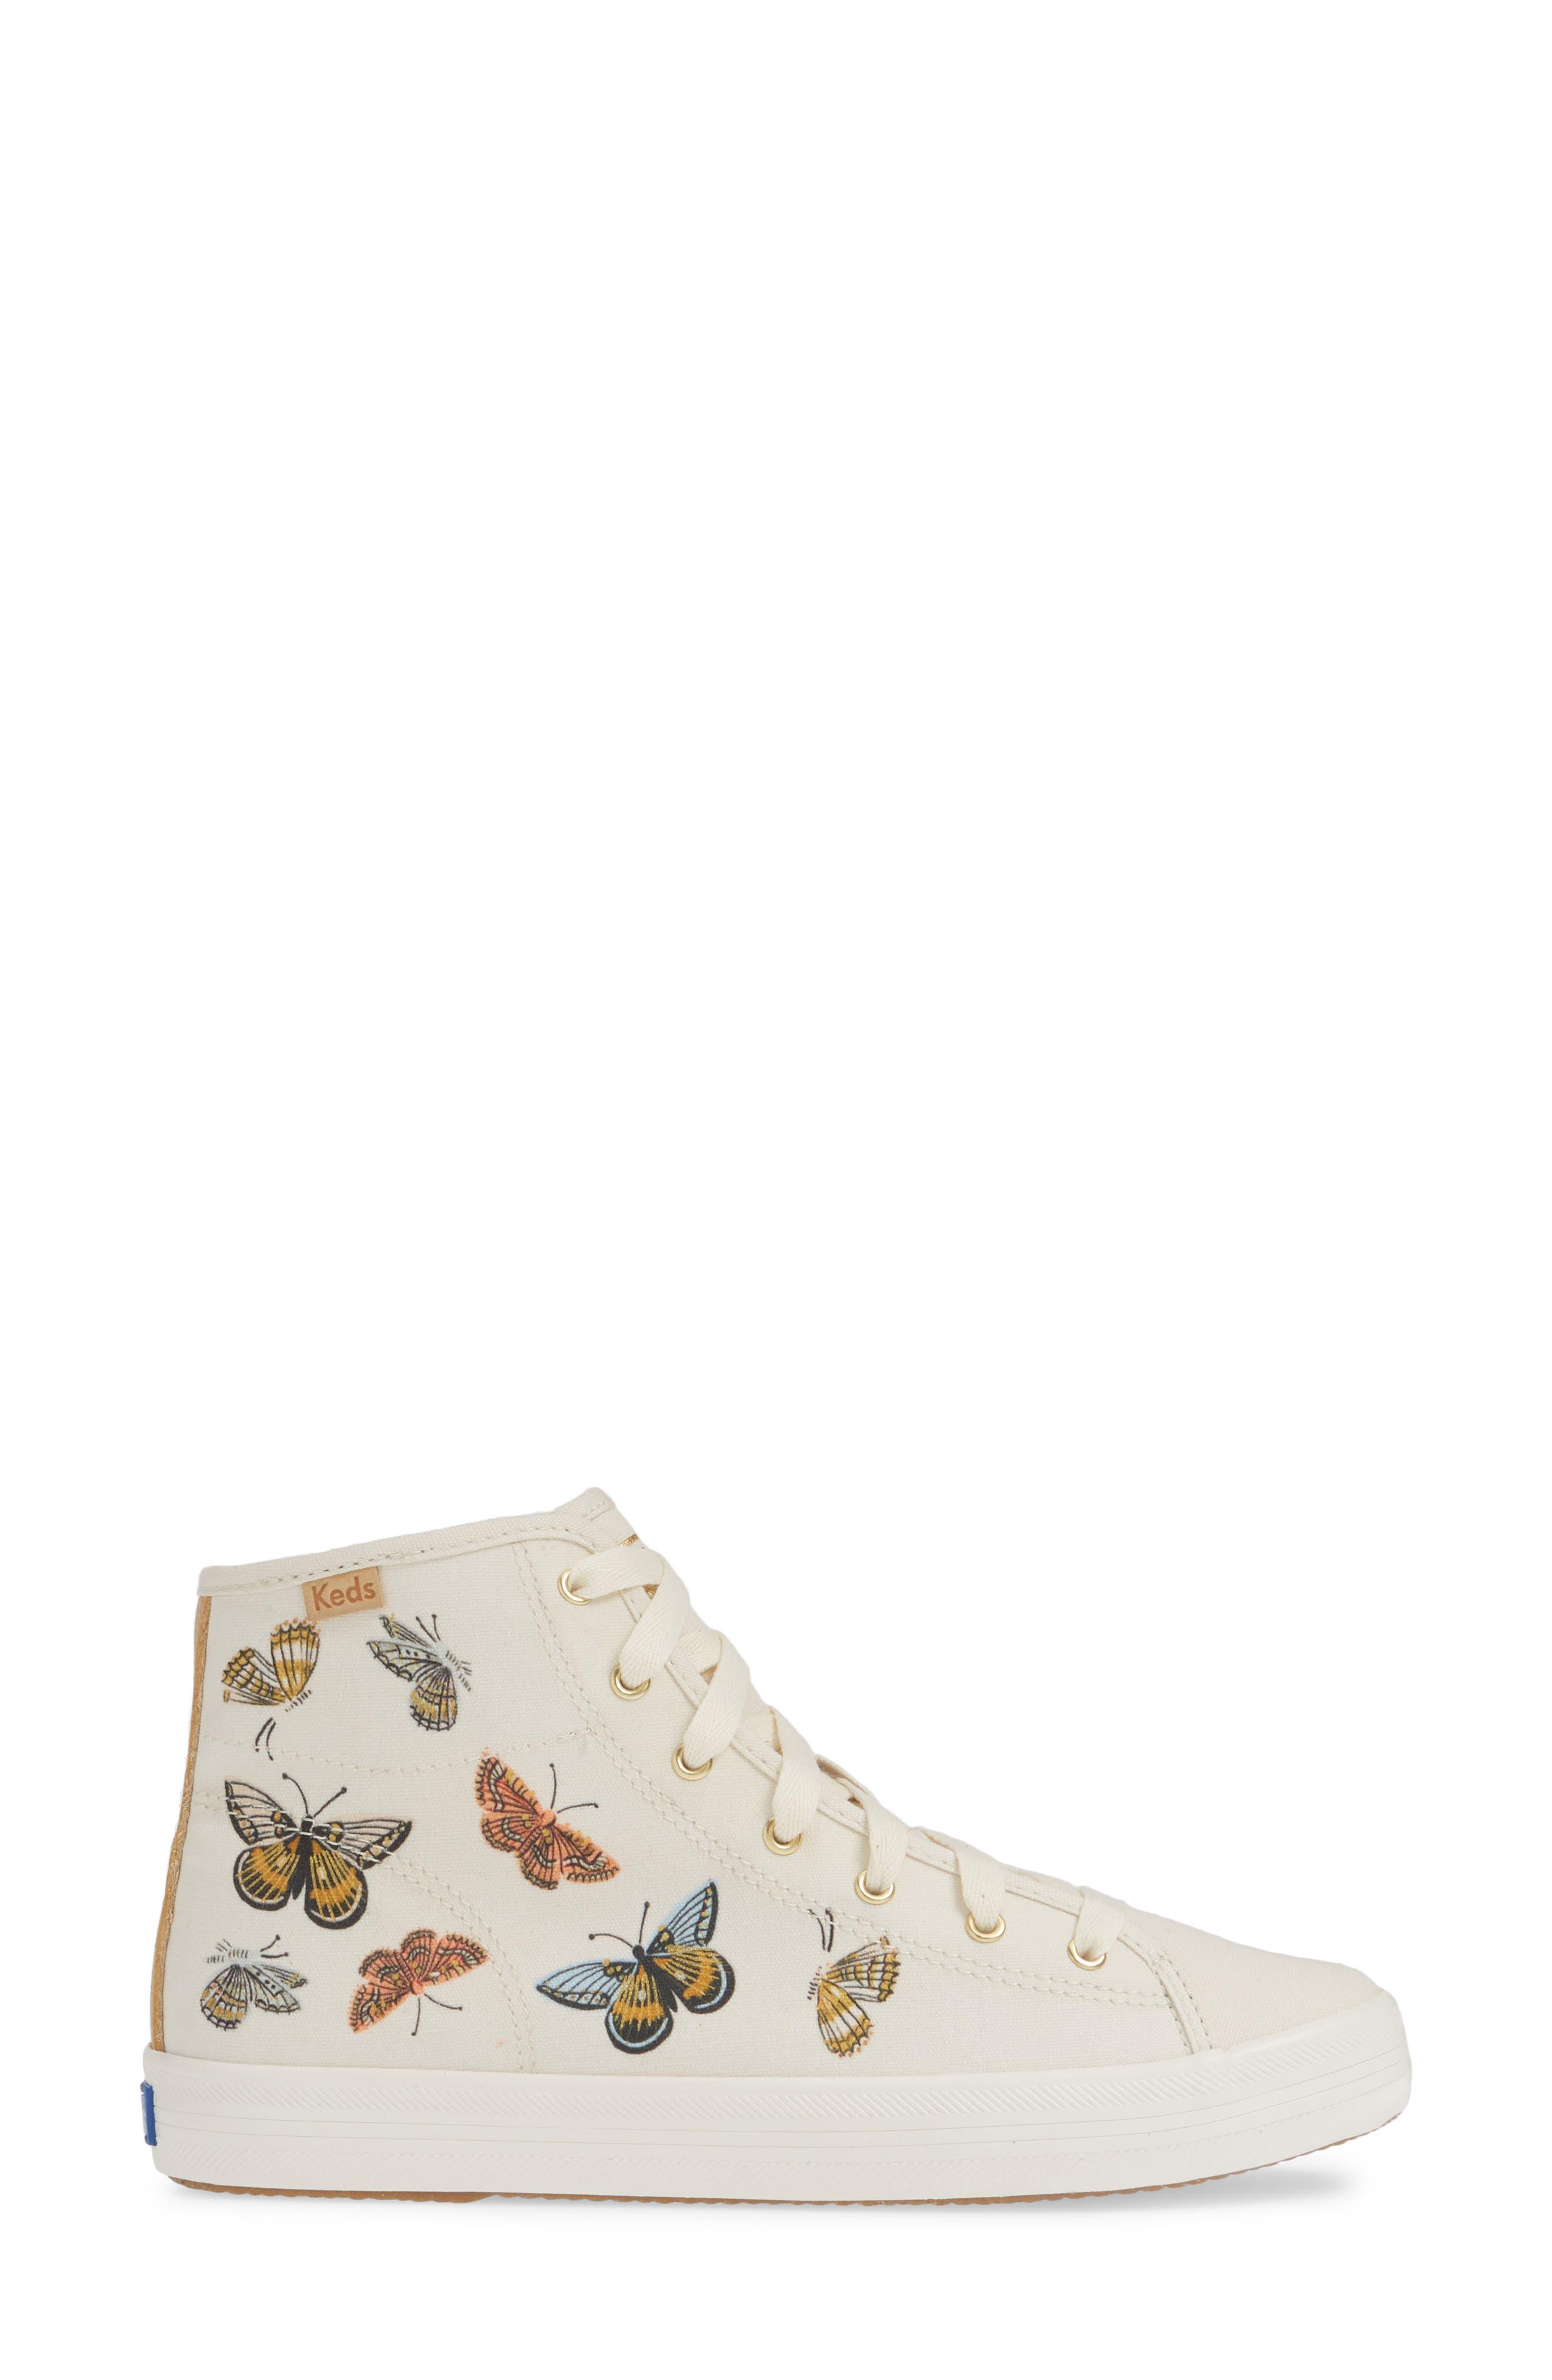 KEDS<SUP>®</SUP>, x Rifle Paper Co. Kickstart Butterfly Sneaker, Alternate thumbnail 3, color, CREAM